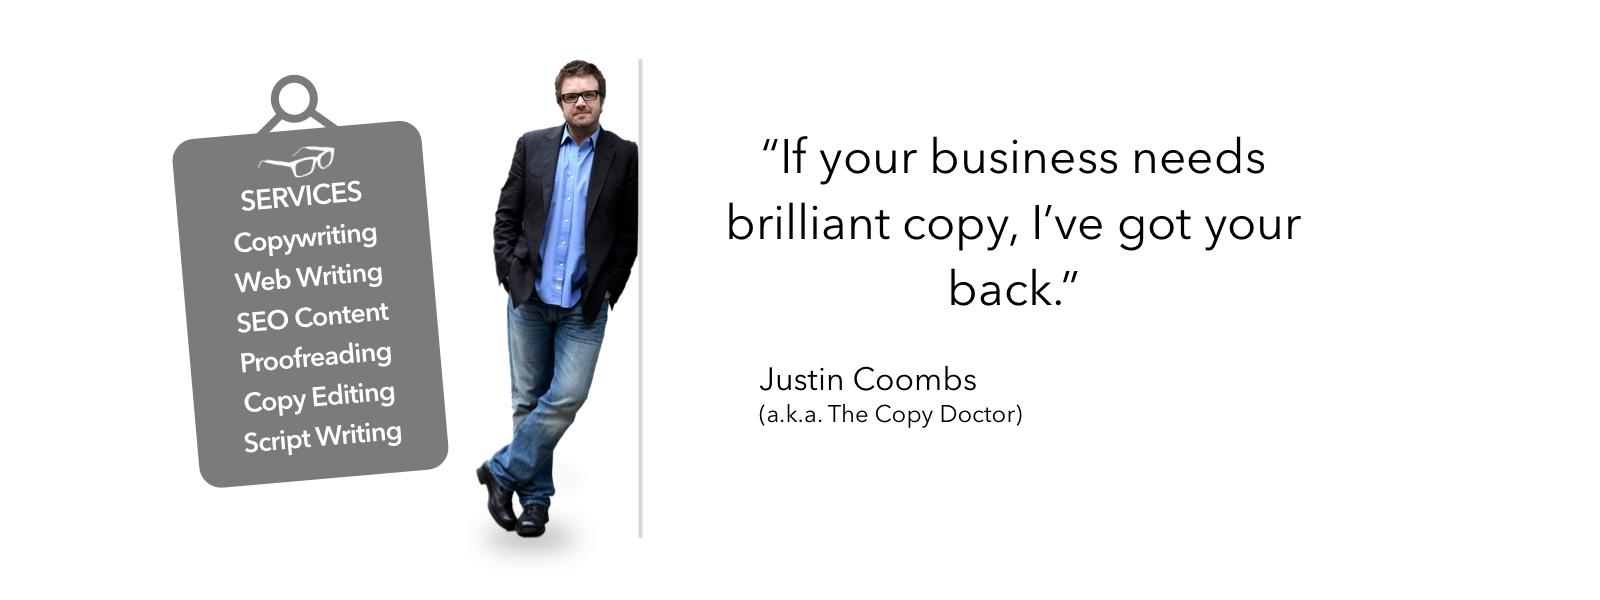 Juston Coombs, Copywriter